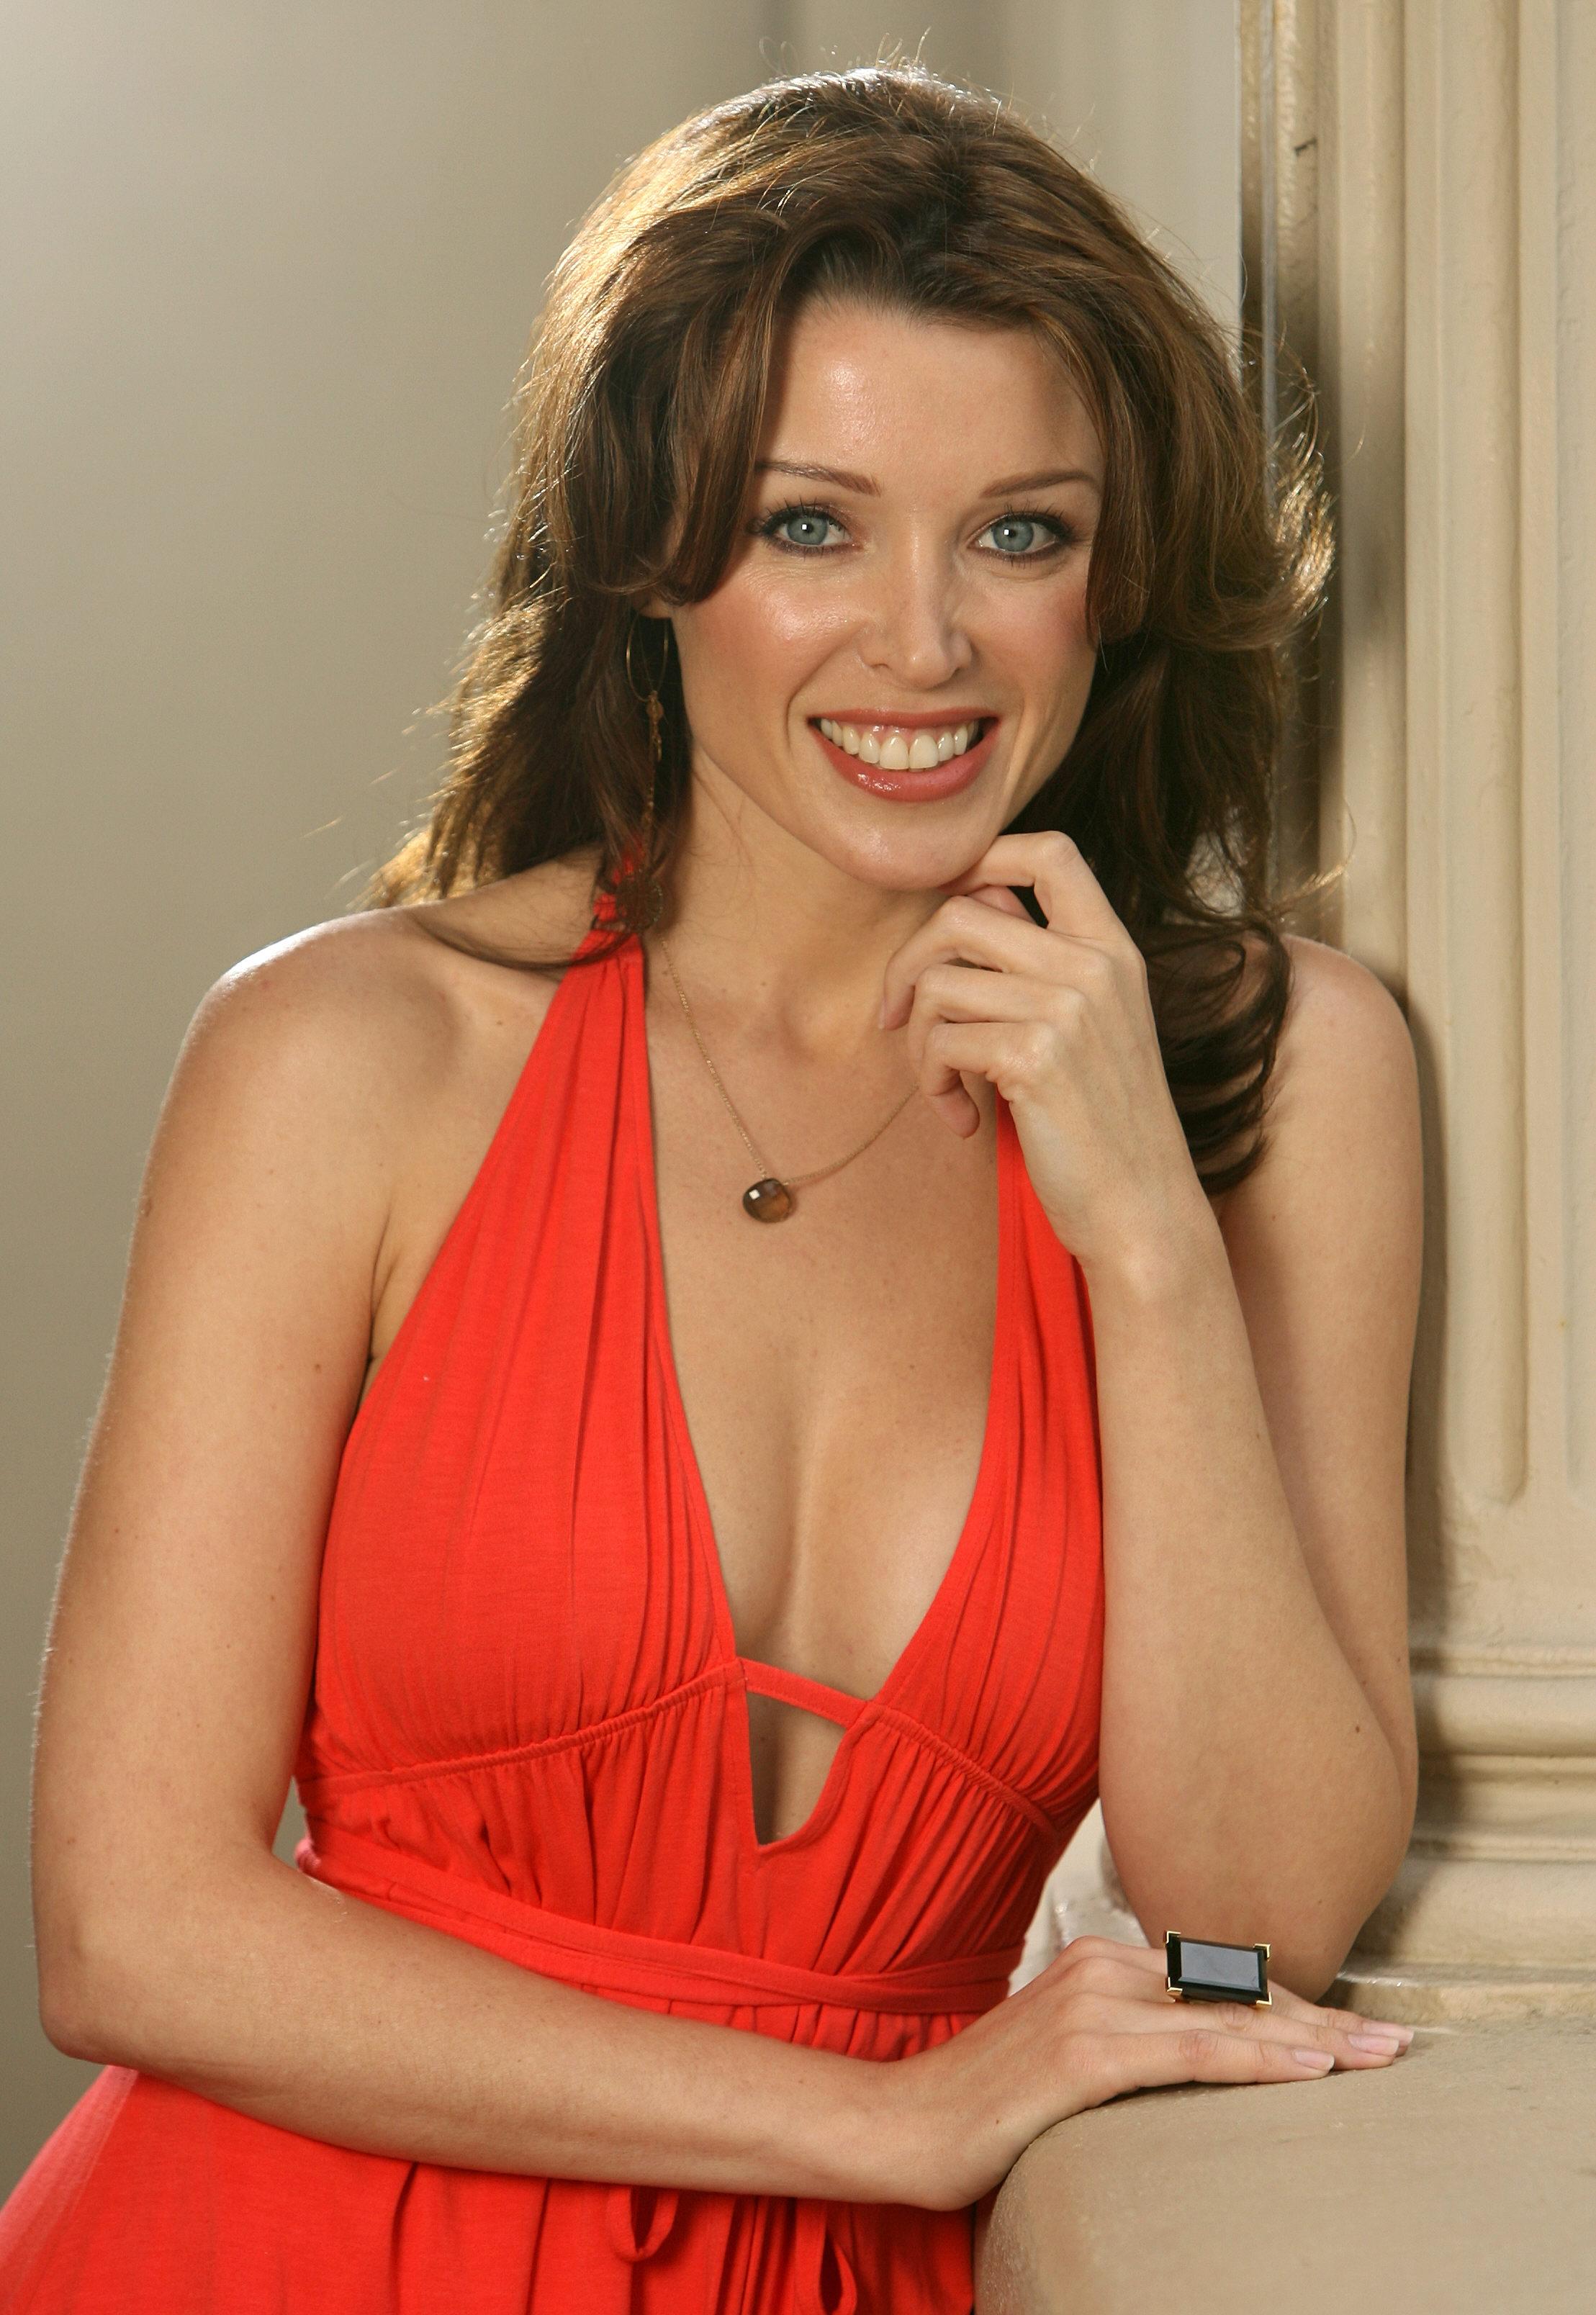 07625_Dannii_Minogue_Craig_Borrow_shoot_04_122_355lo.jpg